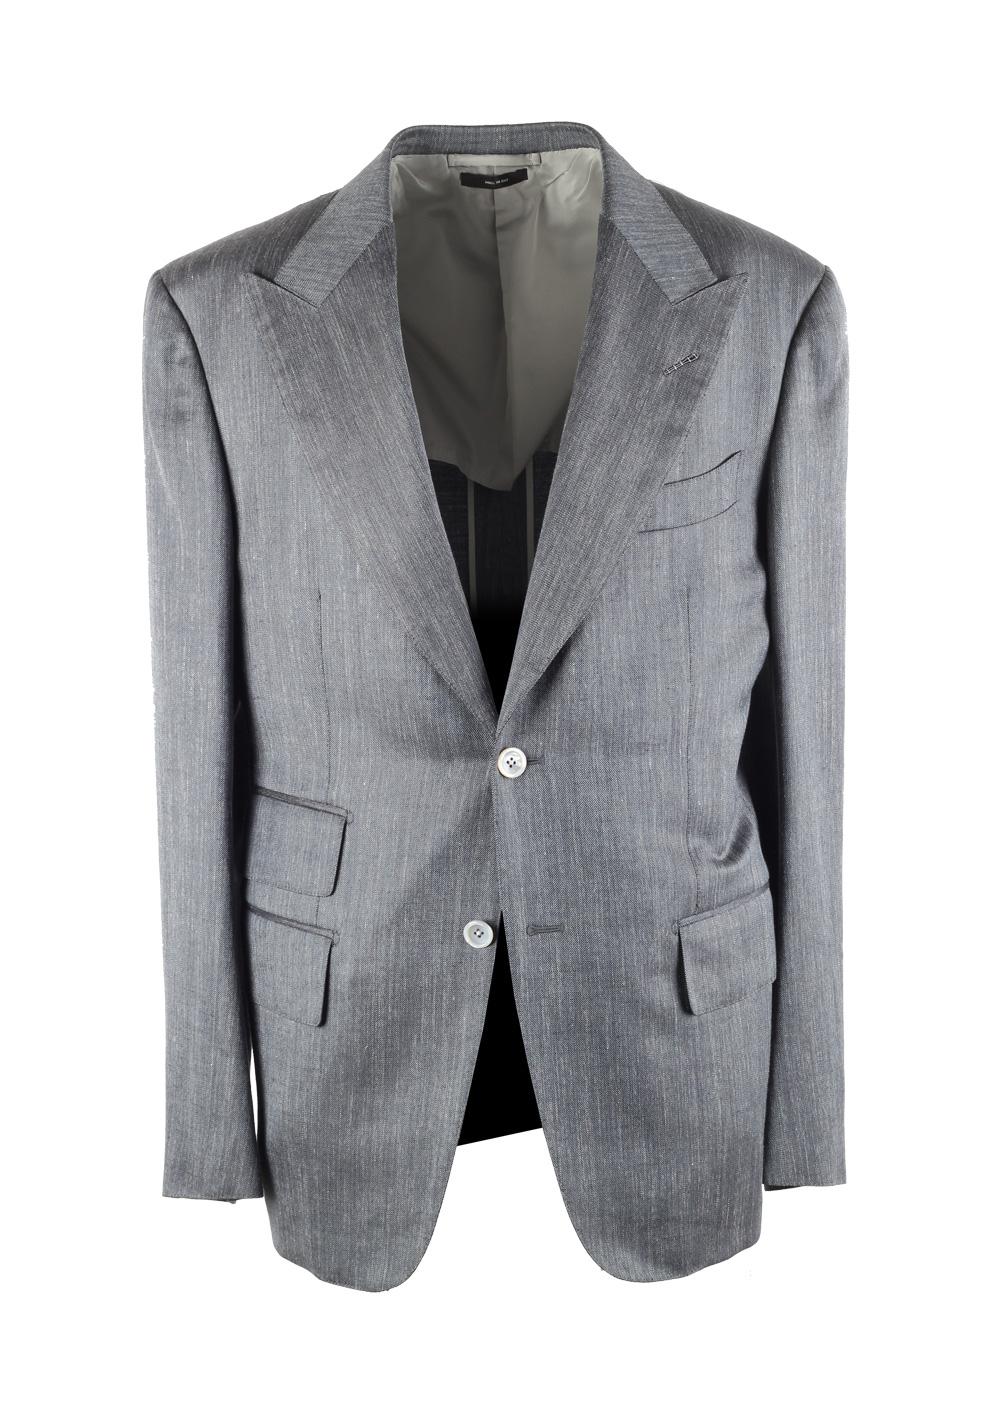 TOM FORD Spencer Gray Sport Coat Size 50 / 40R U.S. | Costume Limité